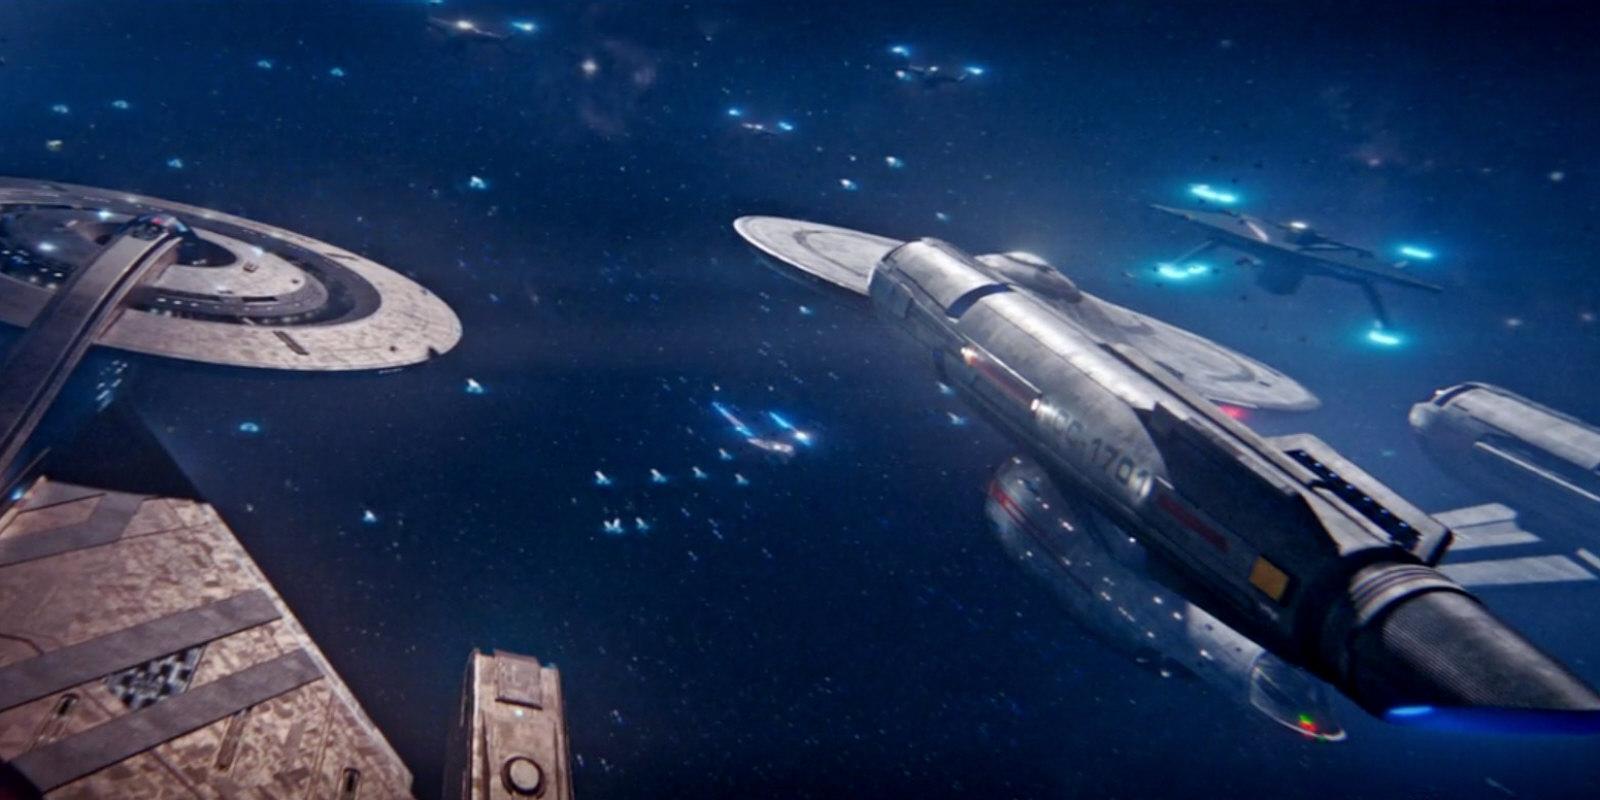 Ex Astris Scientia - Star Trek Discovery (DIS) Season 2